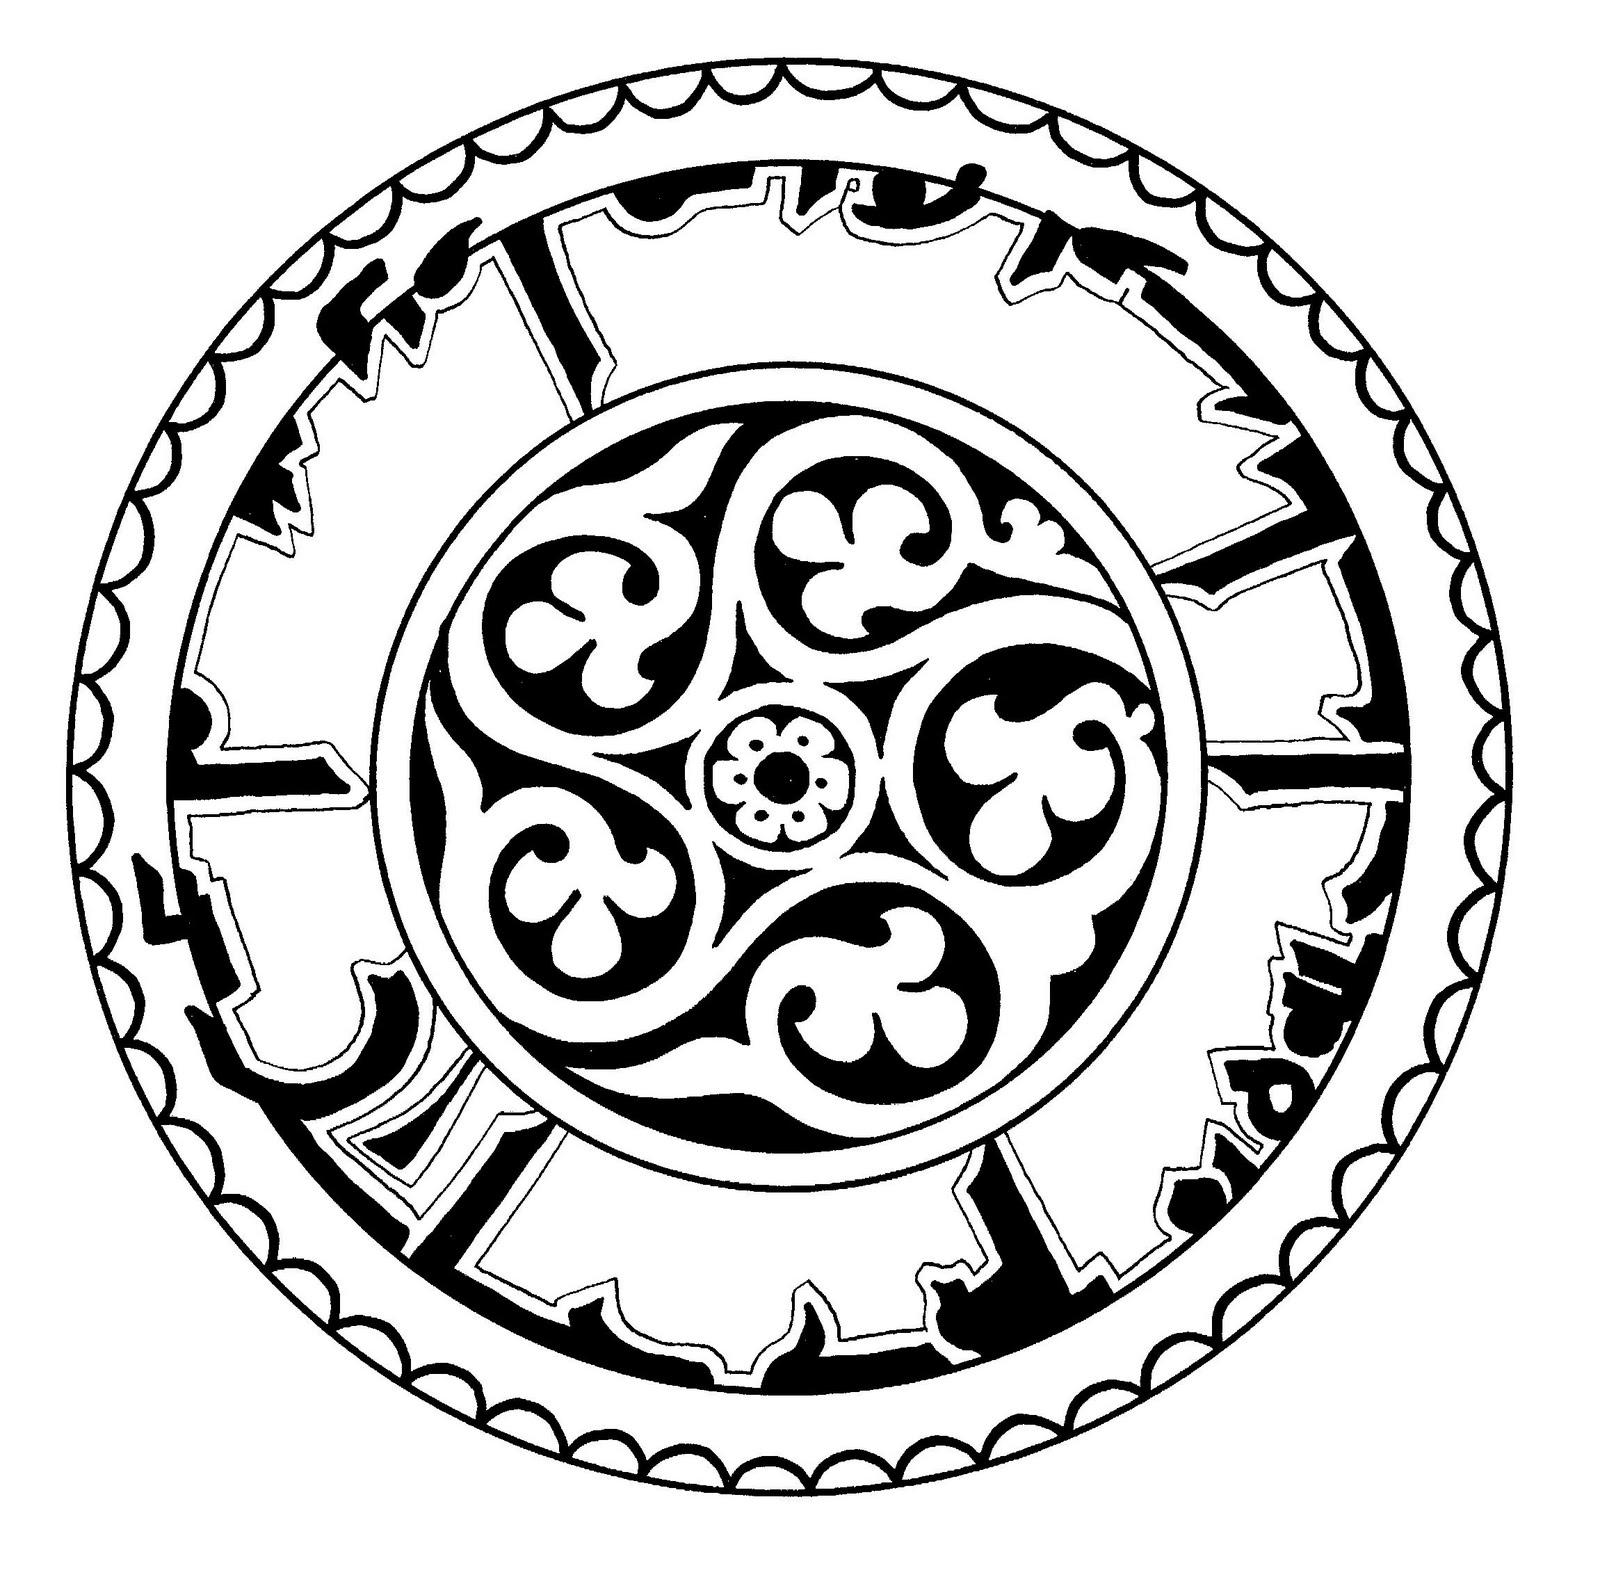 Mandalas Para Pintar: Rueda Persa de Nishapur (Irán)